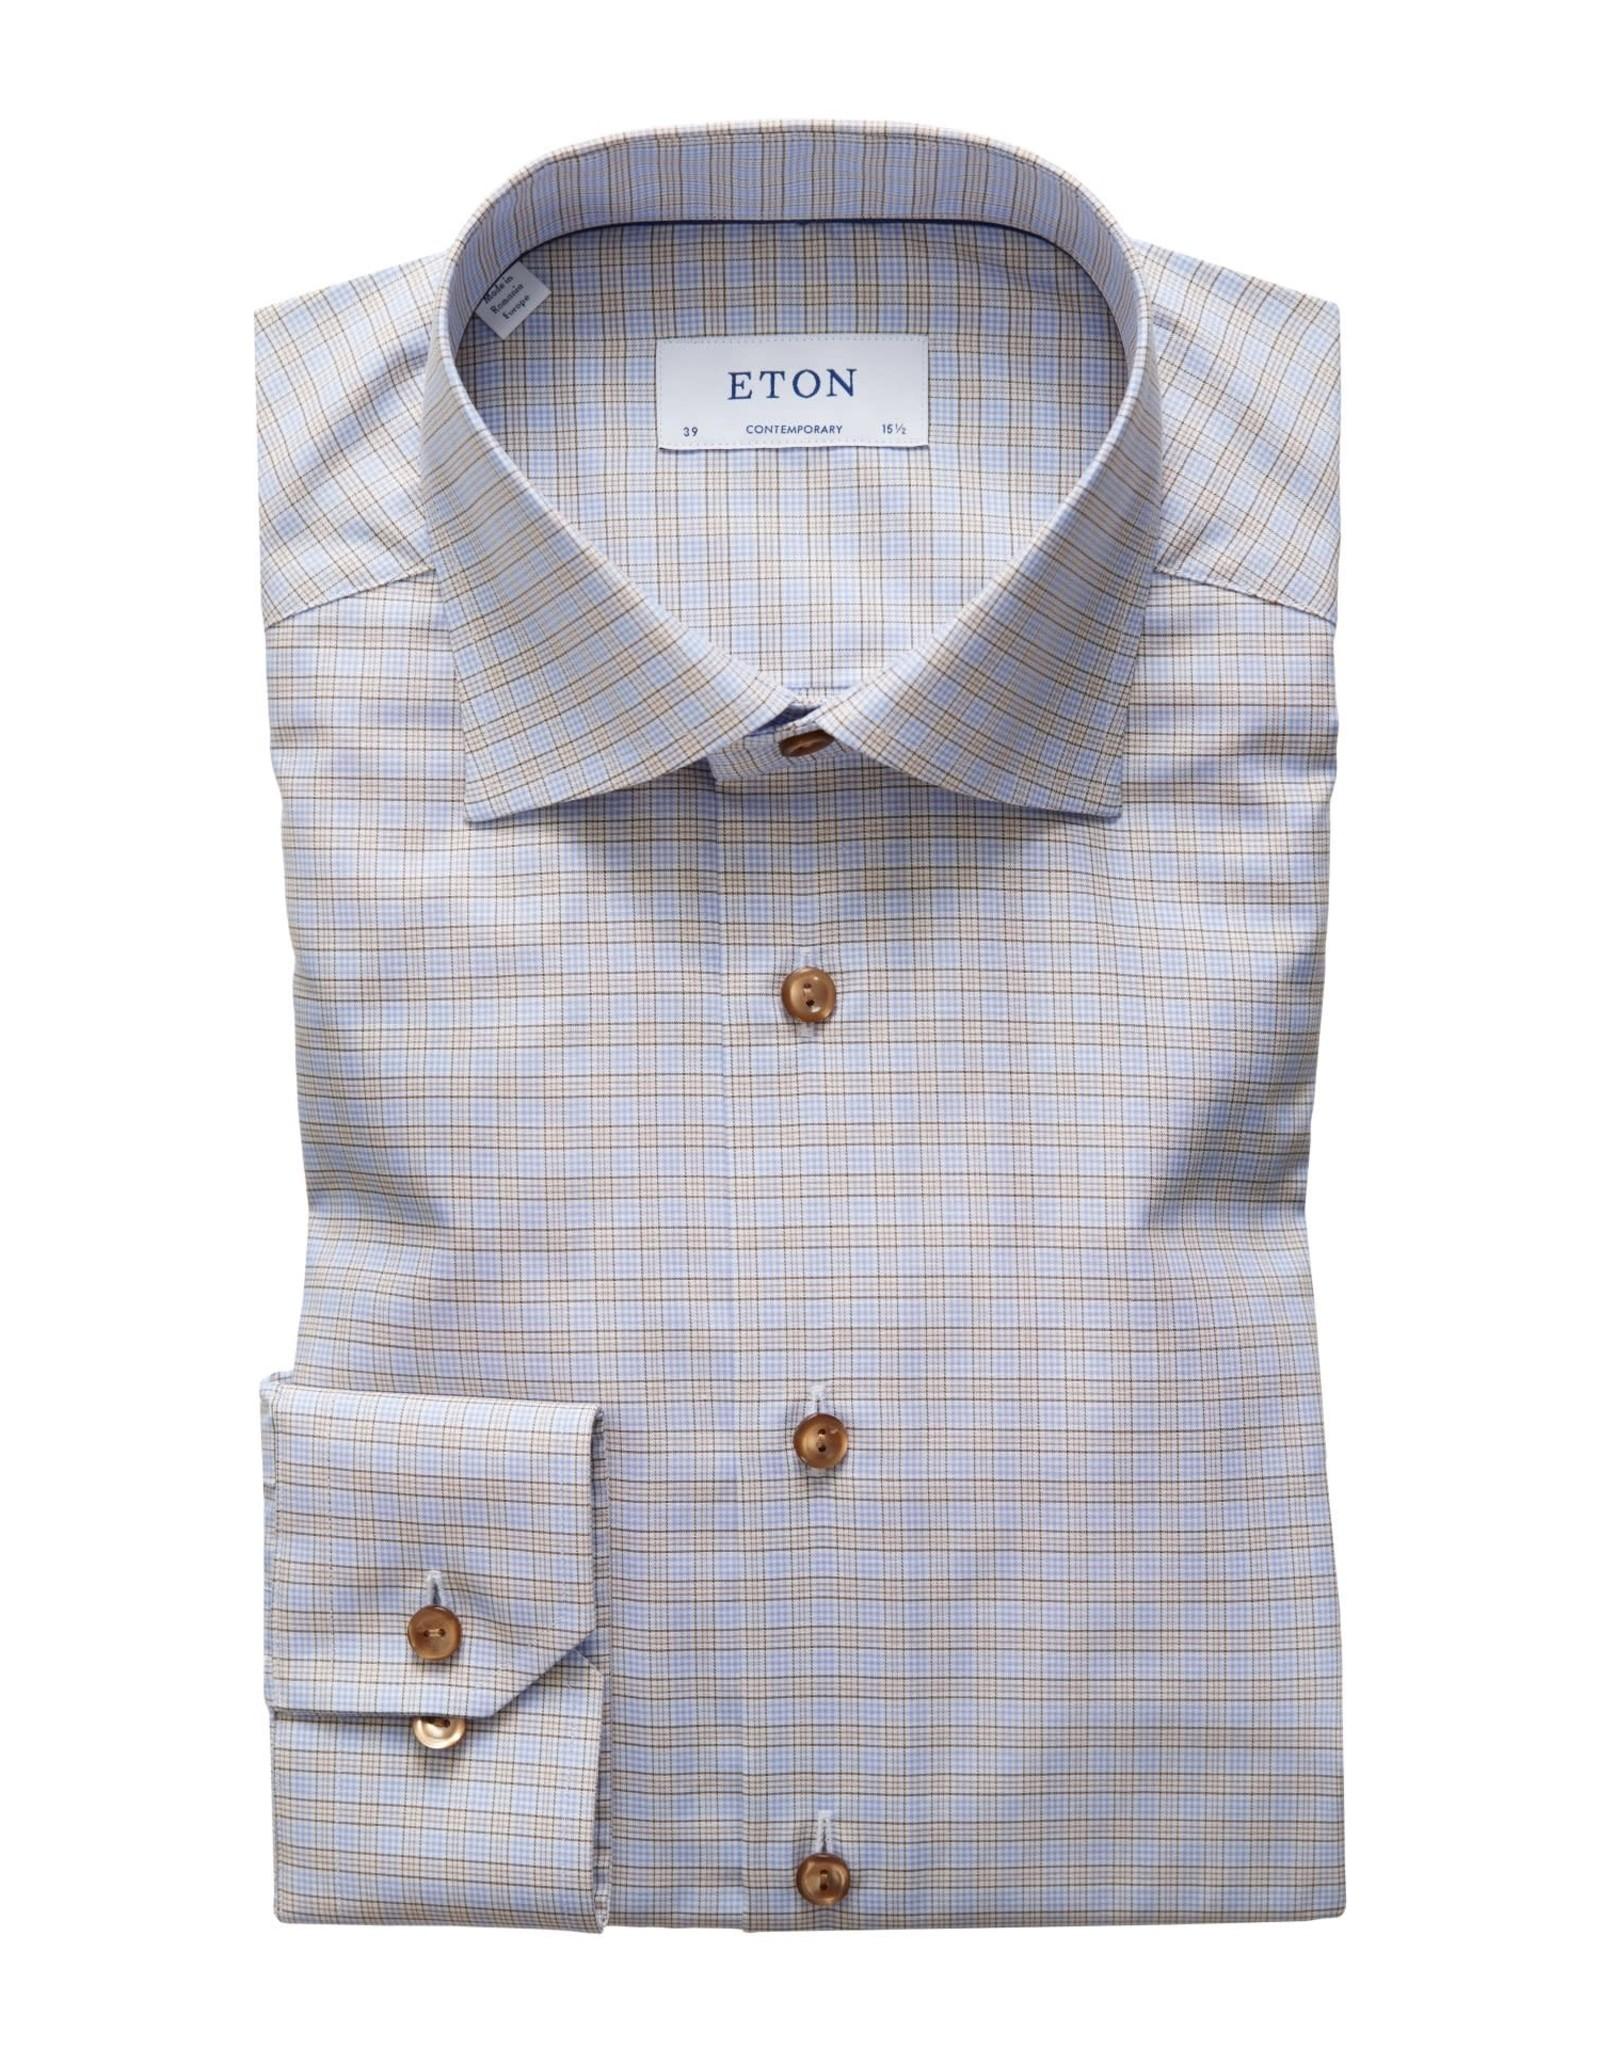 Eton Eton hemd blauw-bruin ruit classicfit 117